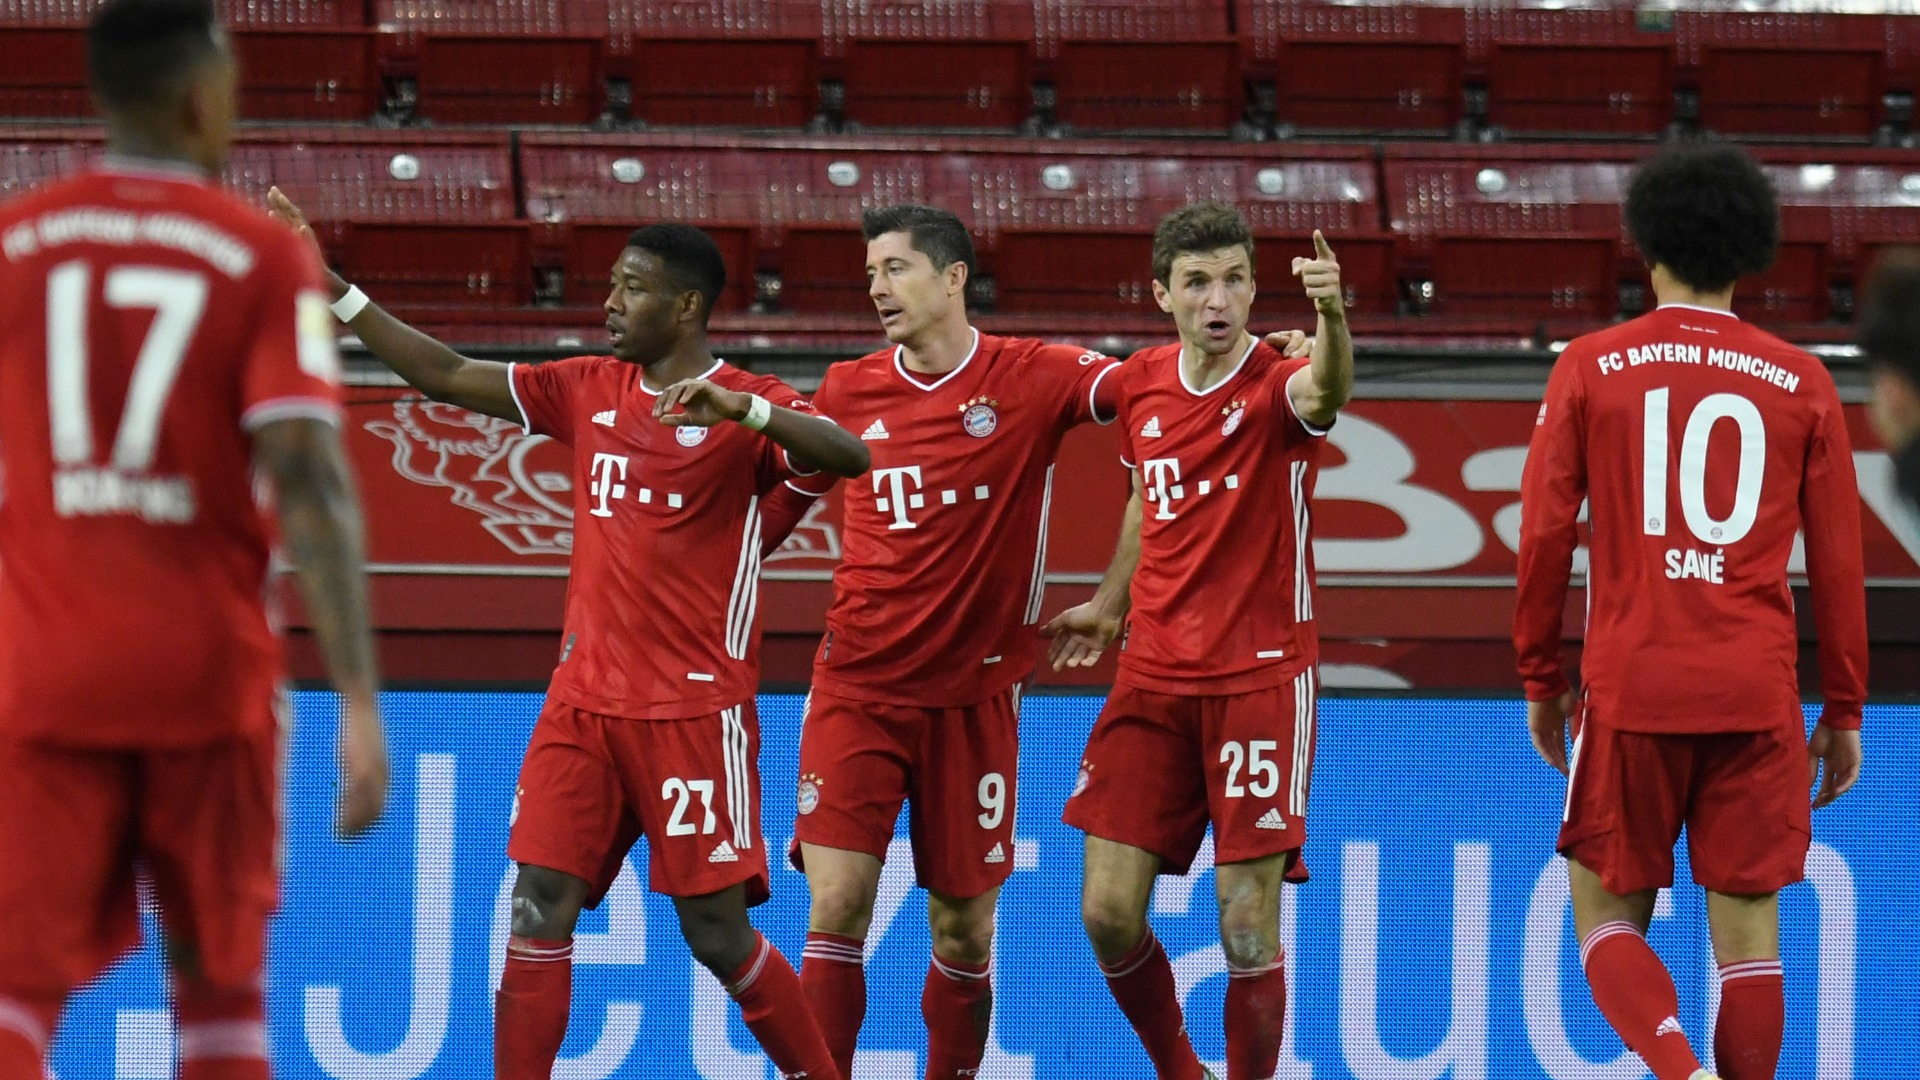 Bayer Leverkusen 1-2 Bayern Munich: Last-gasp Lewandowski sends champions top